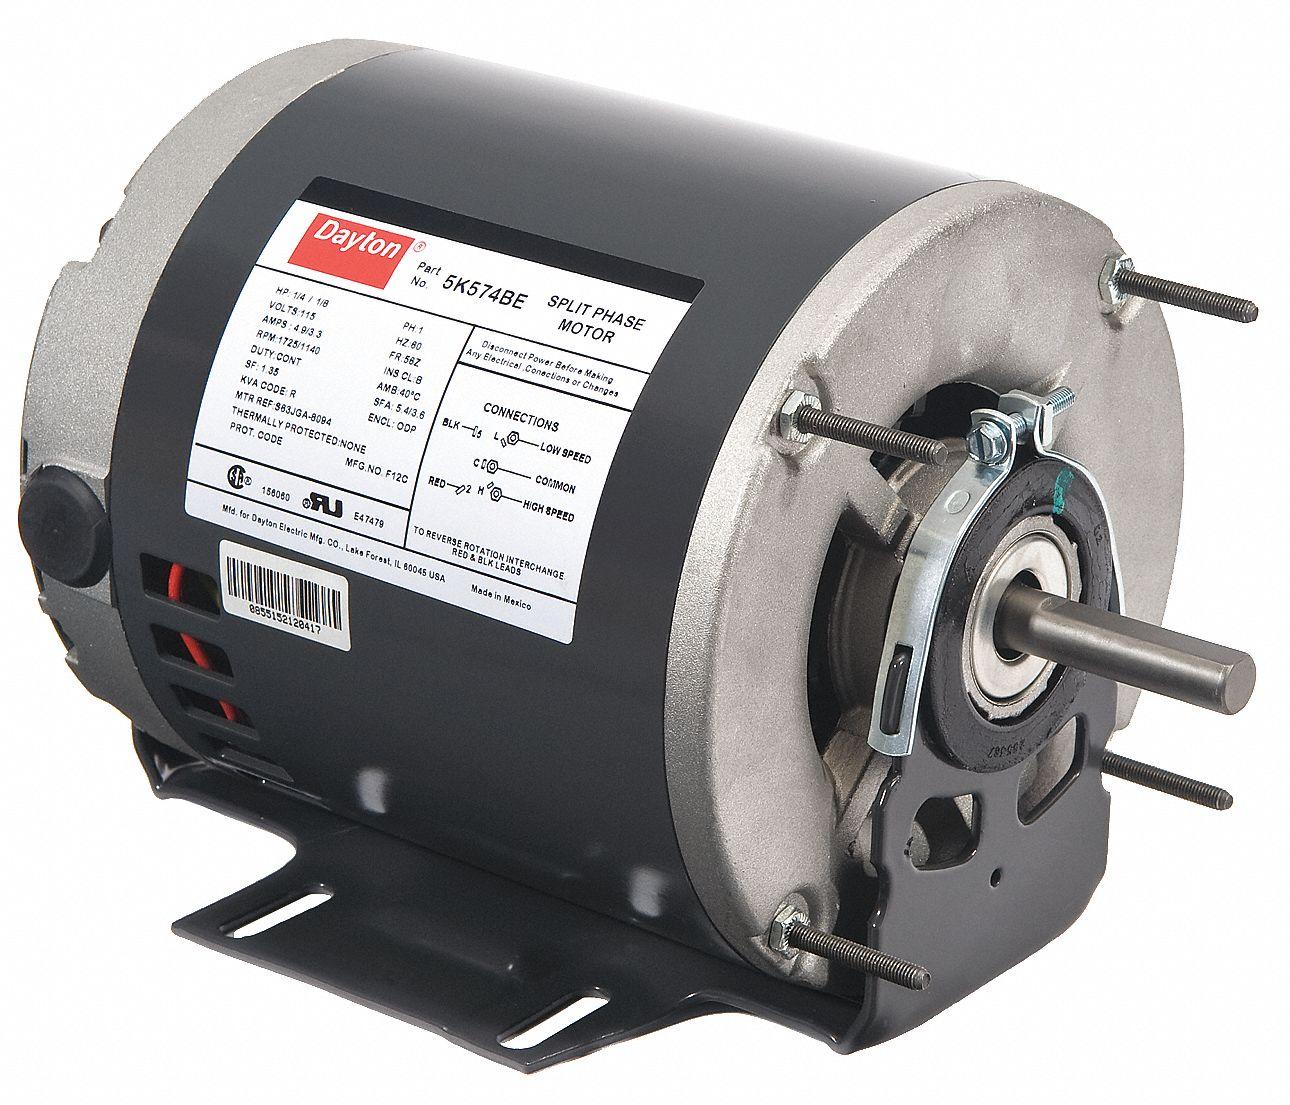 hight resolution of dayton 1 4 1 8 hp general purpose motor split phase 1725 1140 nameplate rpm voltage 115 frame 56z 5k574 5k574 grainger